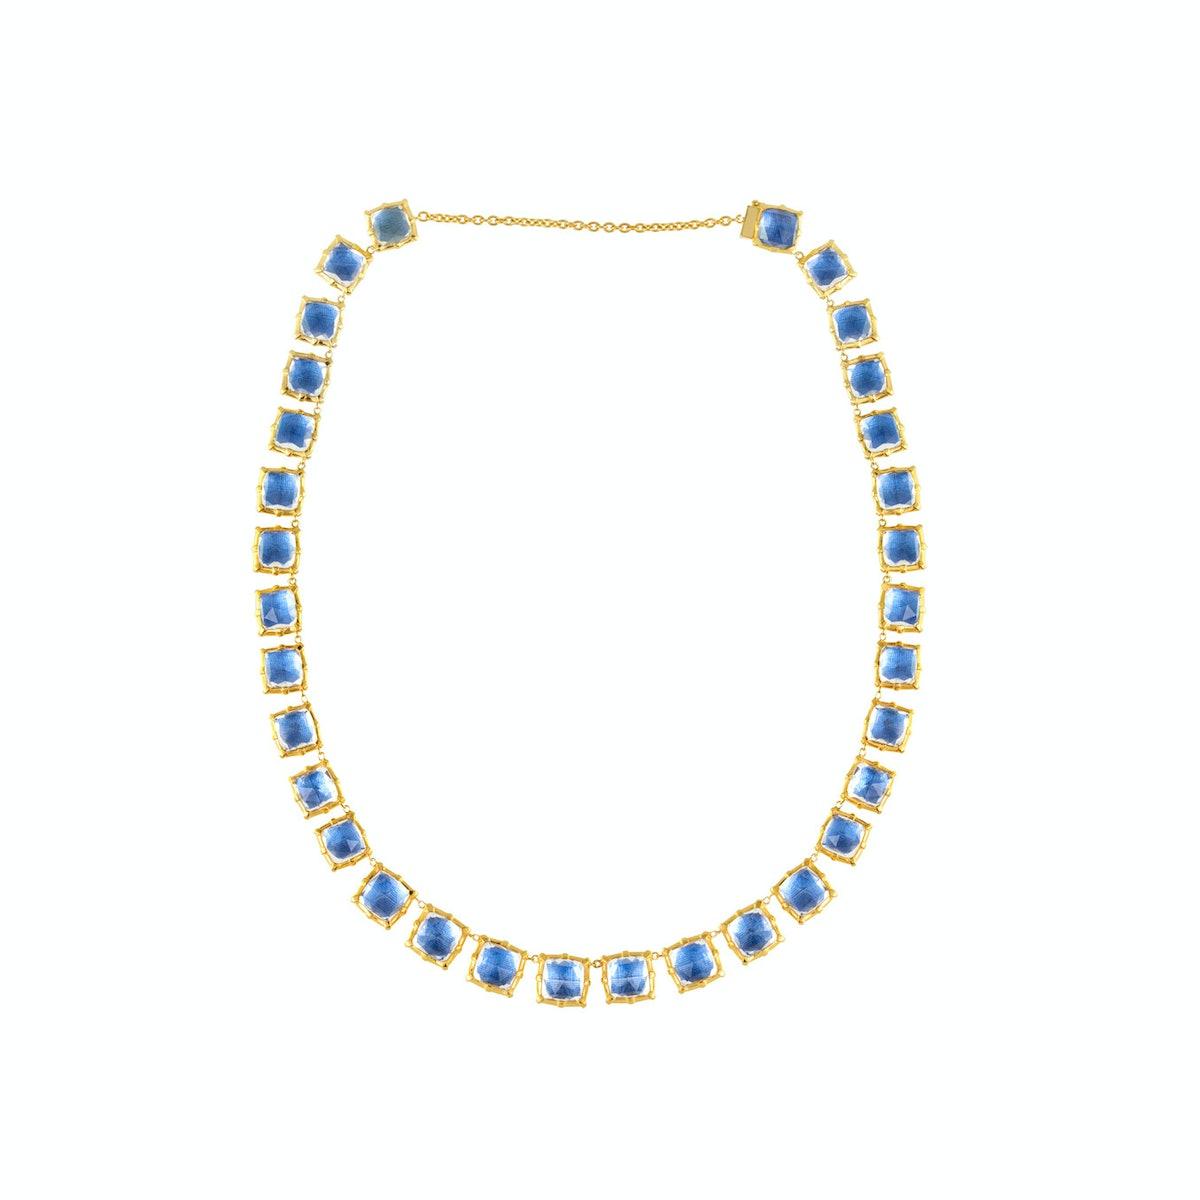 Larkspur & Hawk necklace